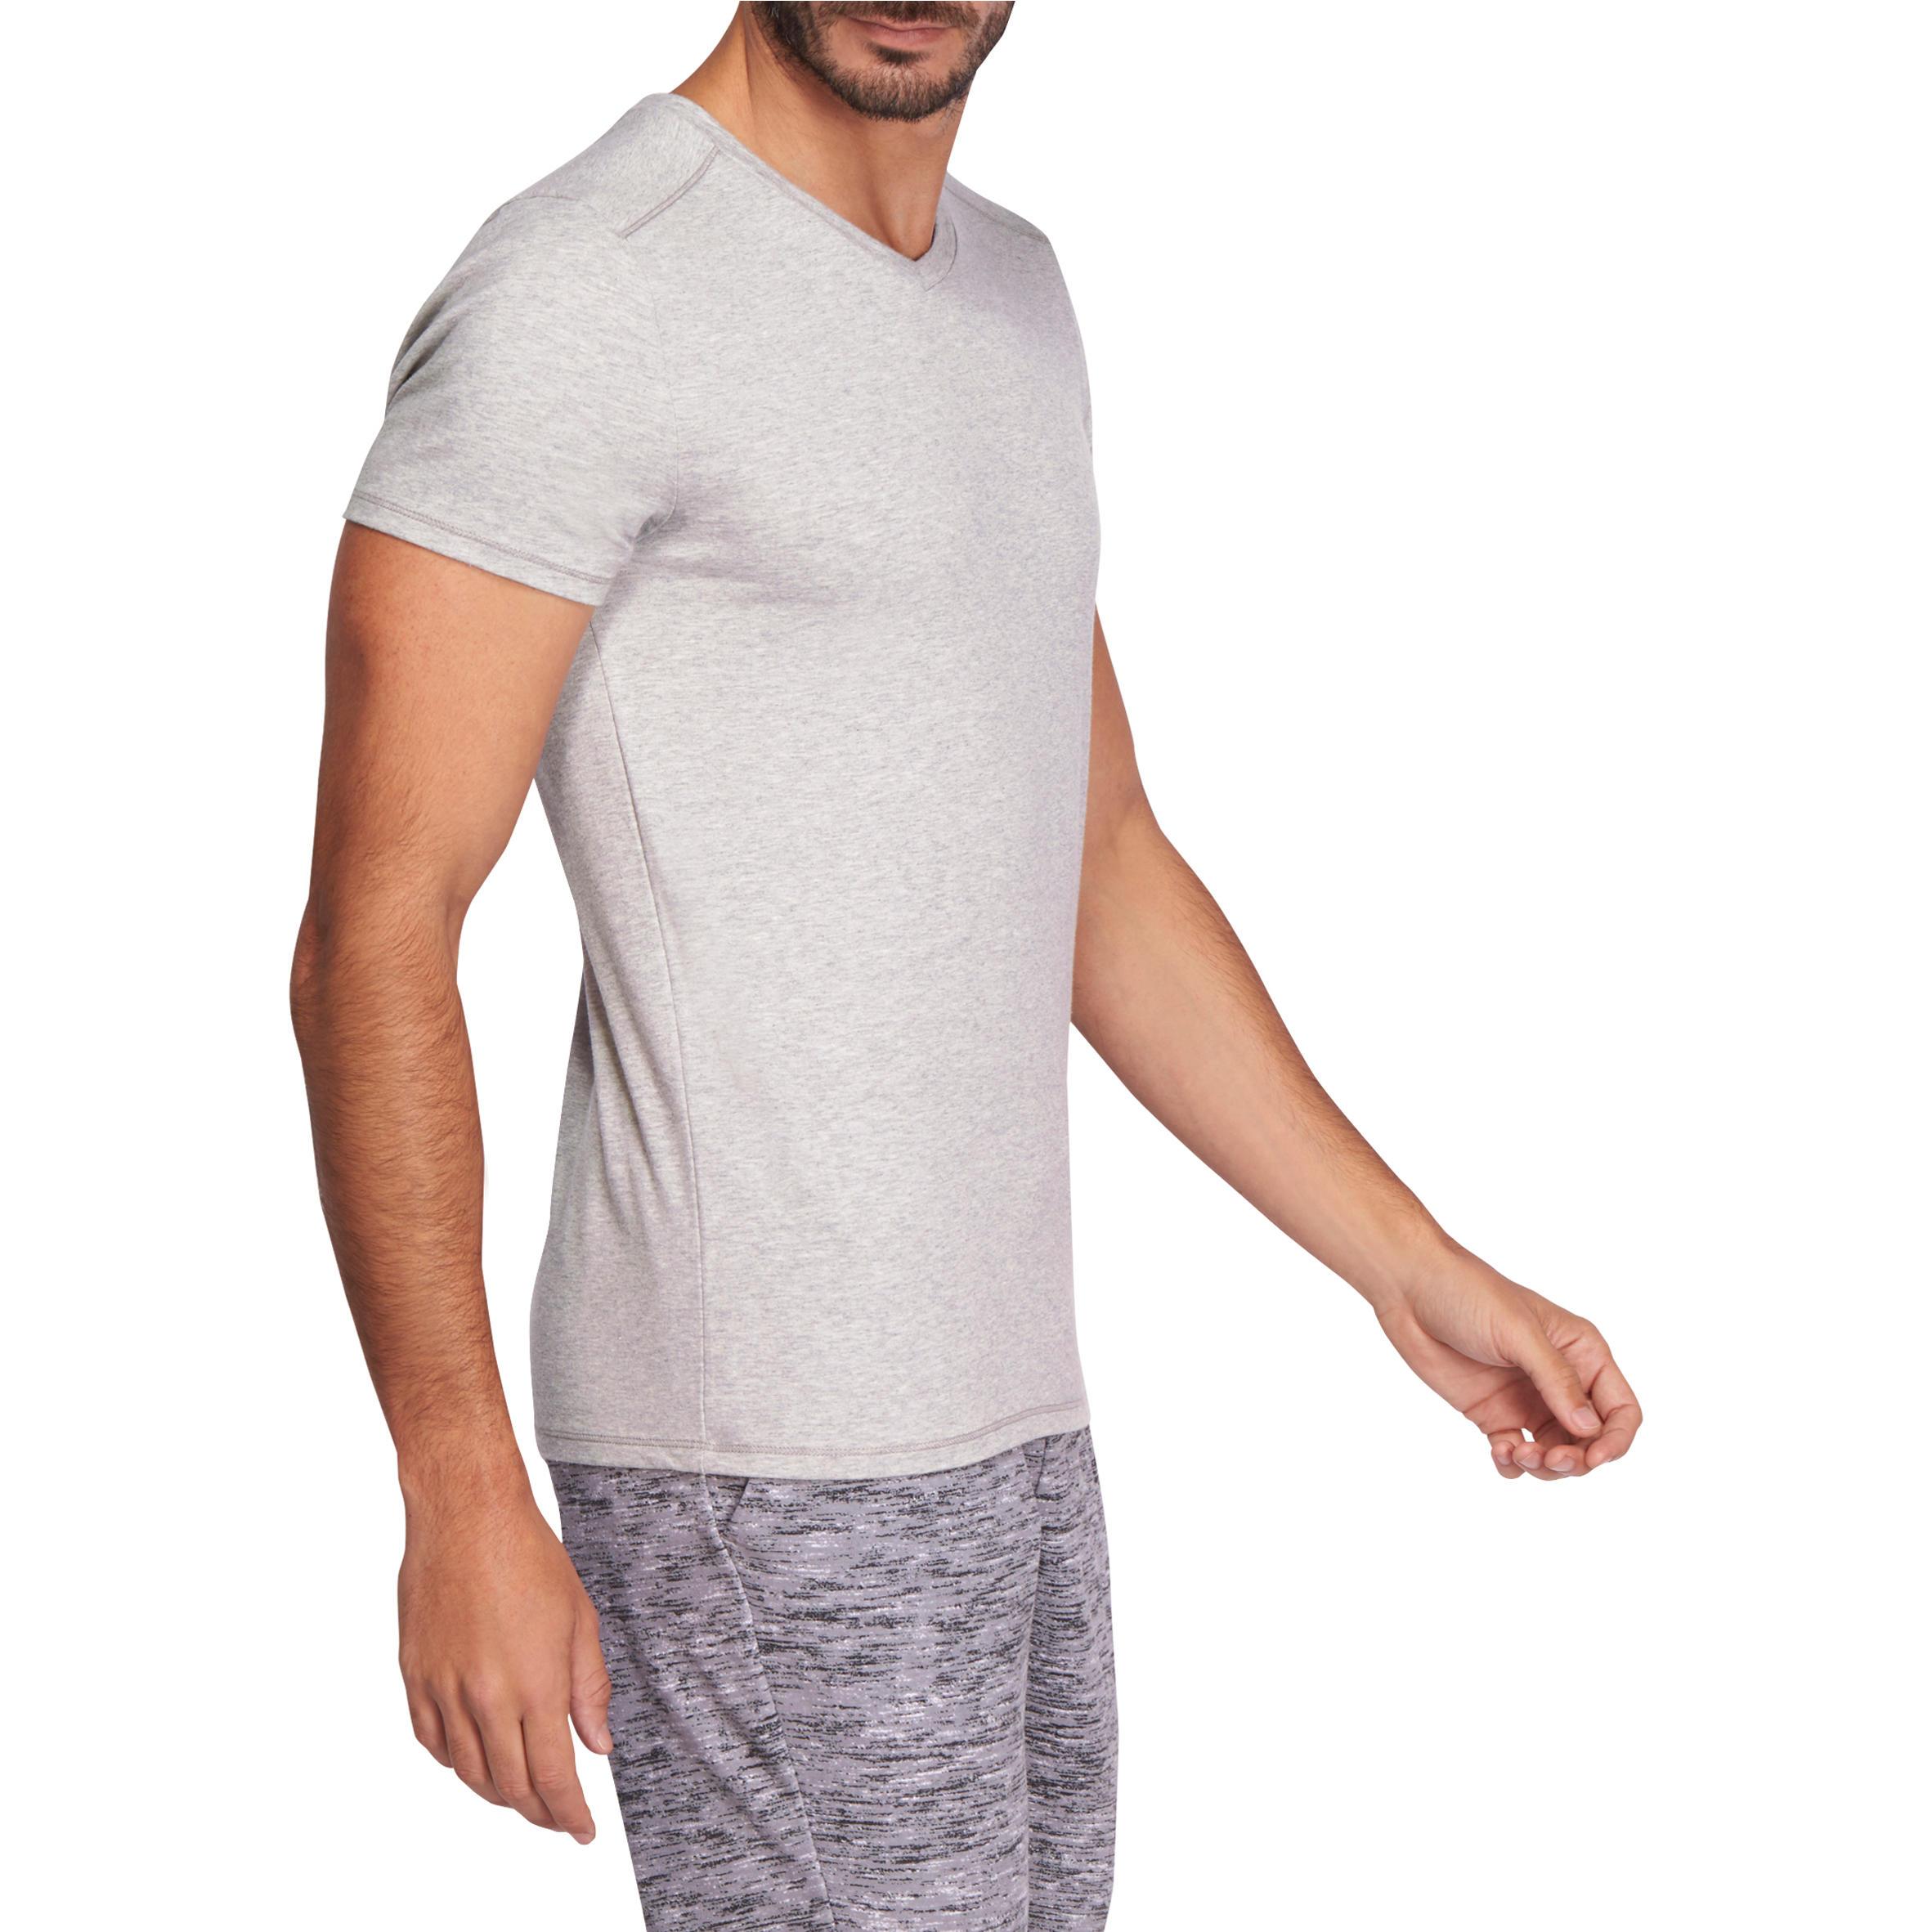 500 V-Neck Slim-Fit Gym & Pilates T-Shirt - Mottled Medium Grey